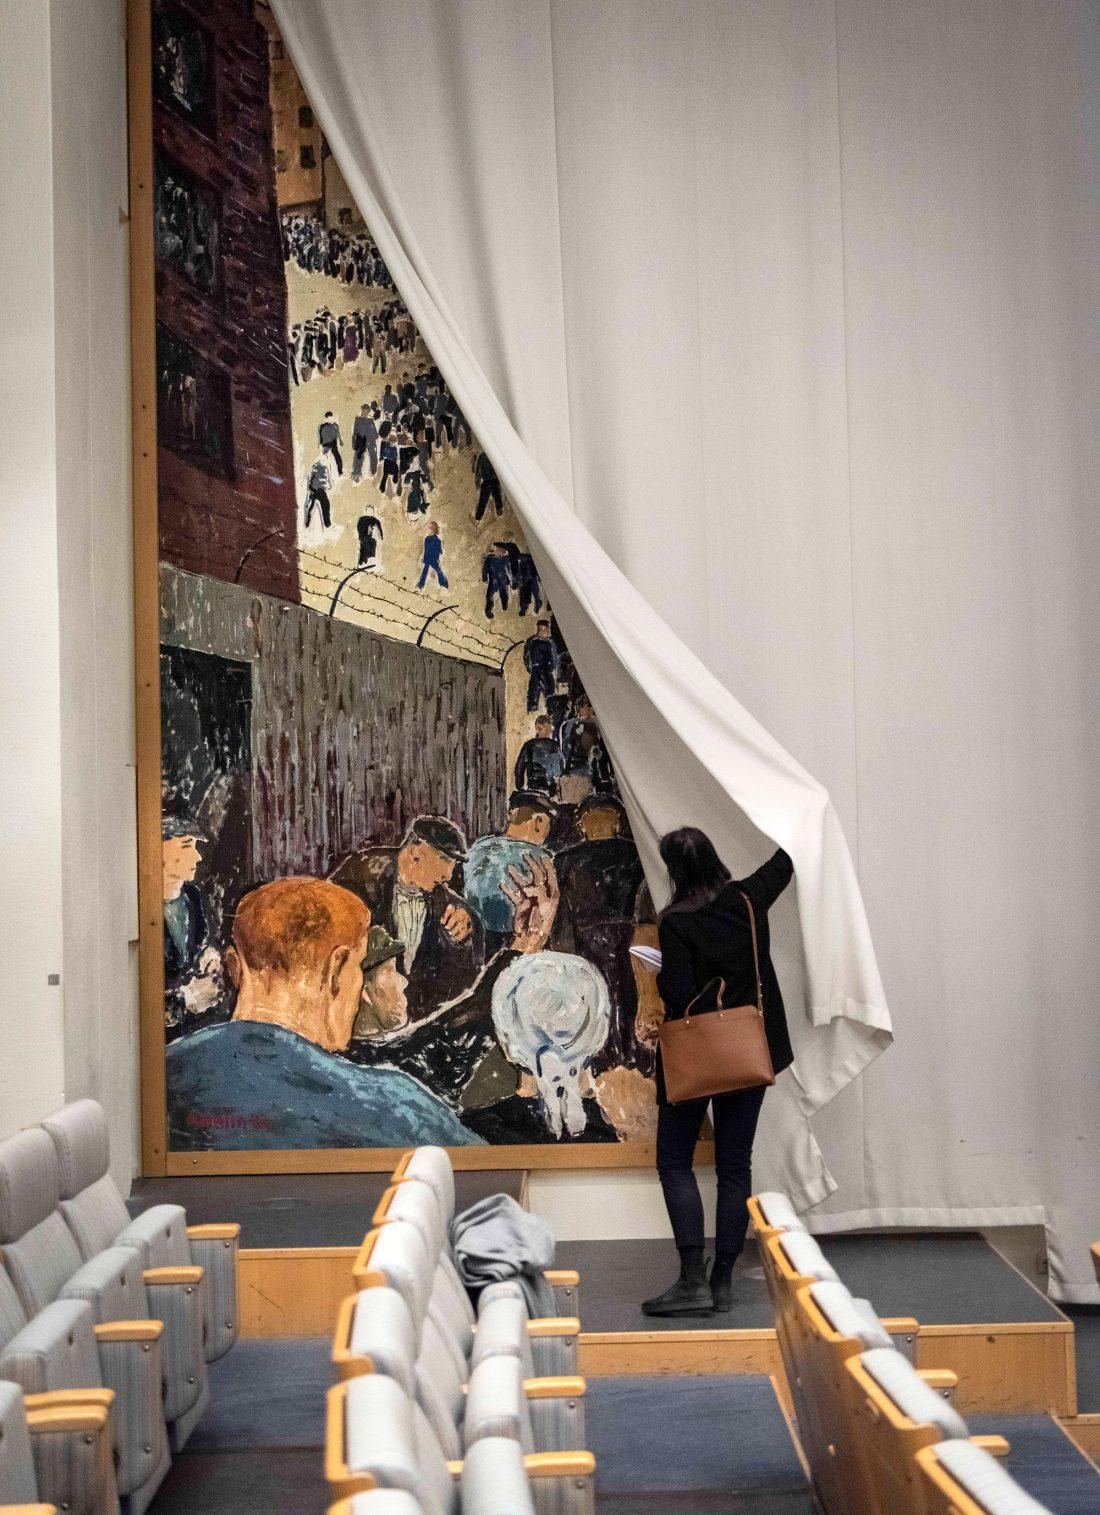 Politisk konst bakom skynke i Folkets hus i Stockholm